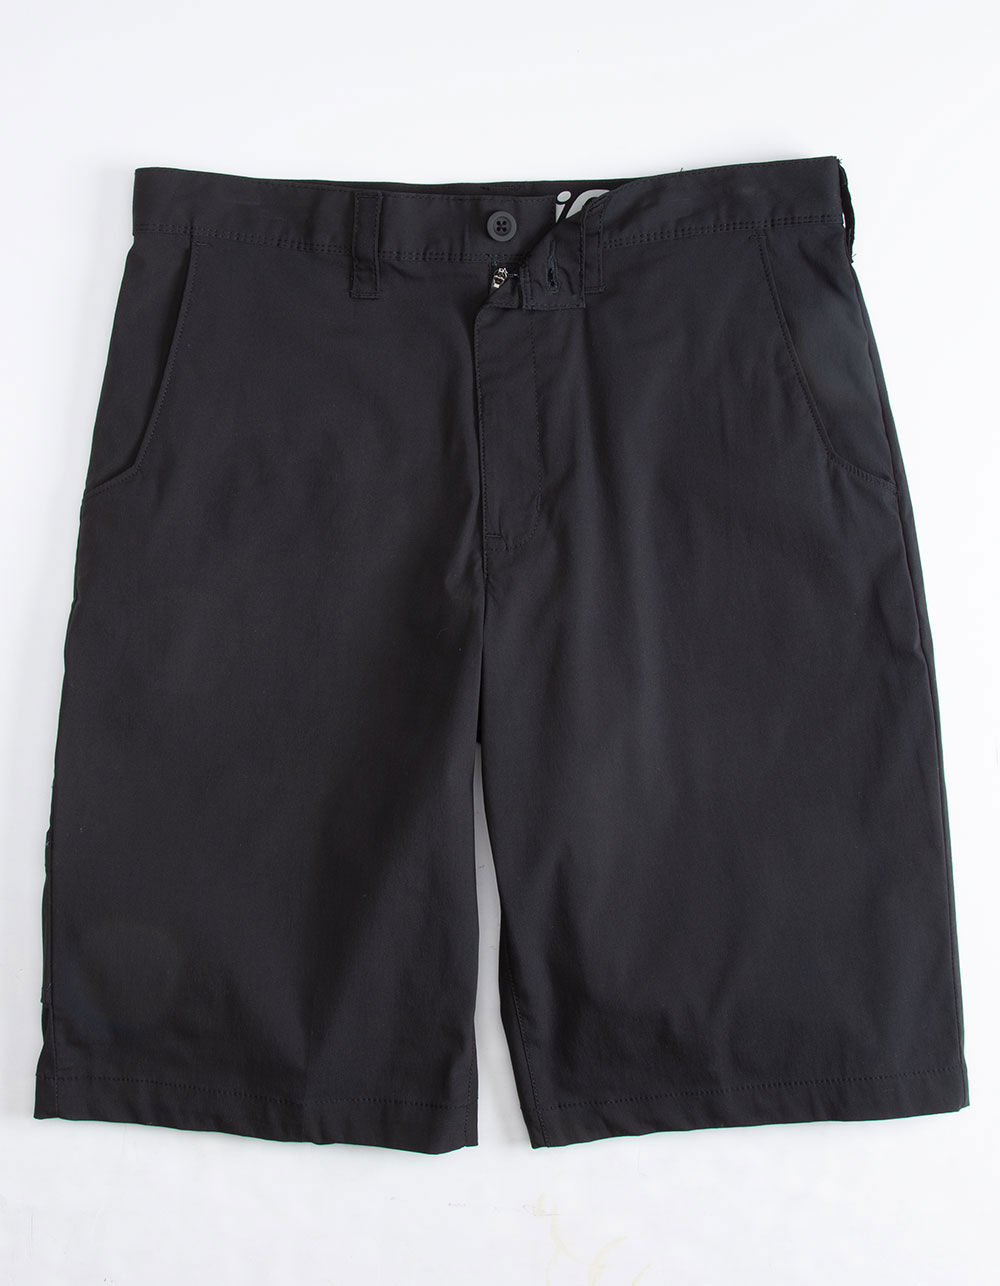 DICKIES Black Hybrid Shorts